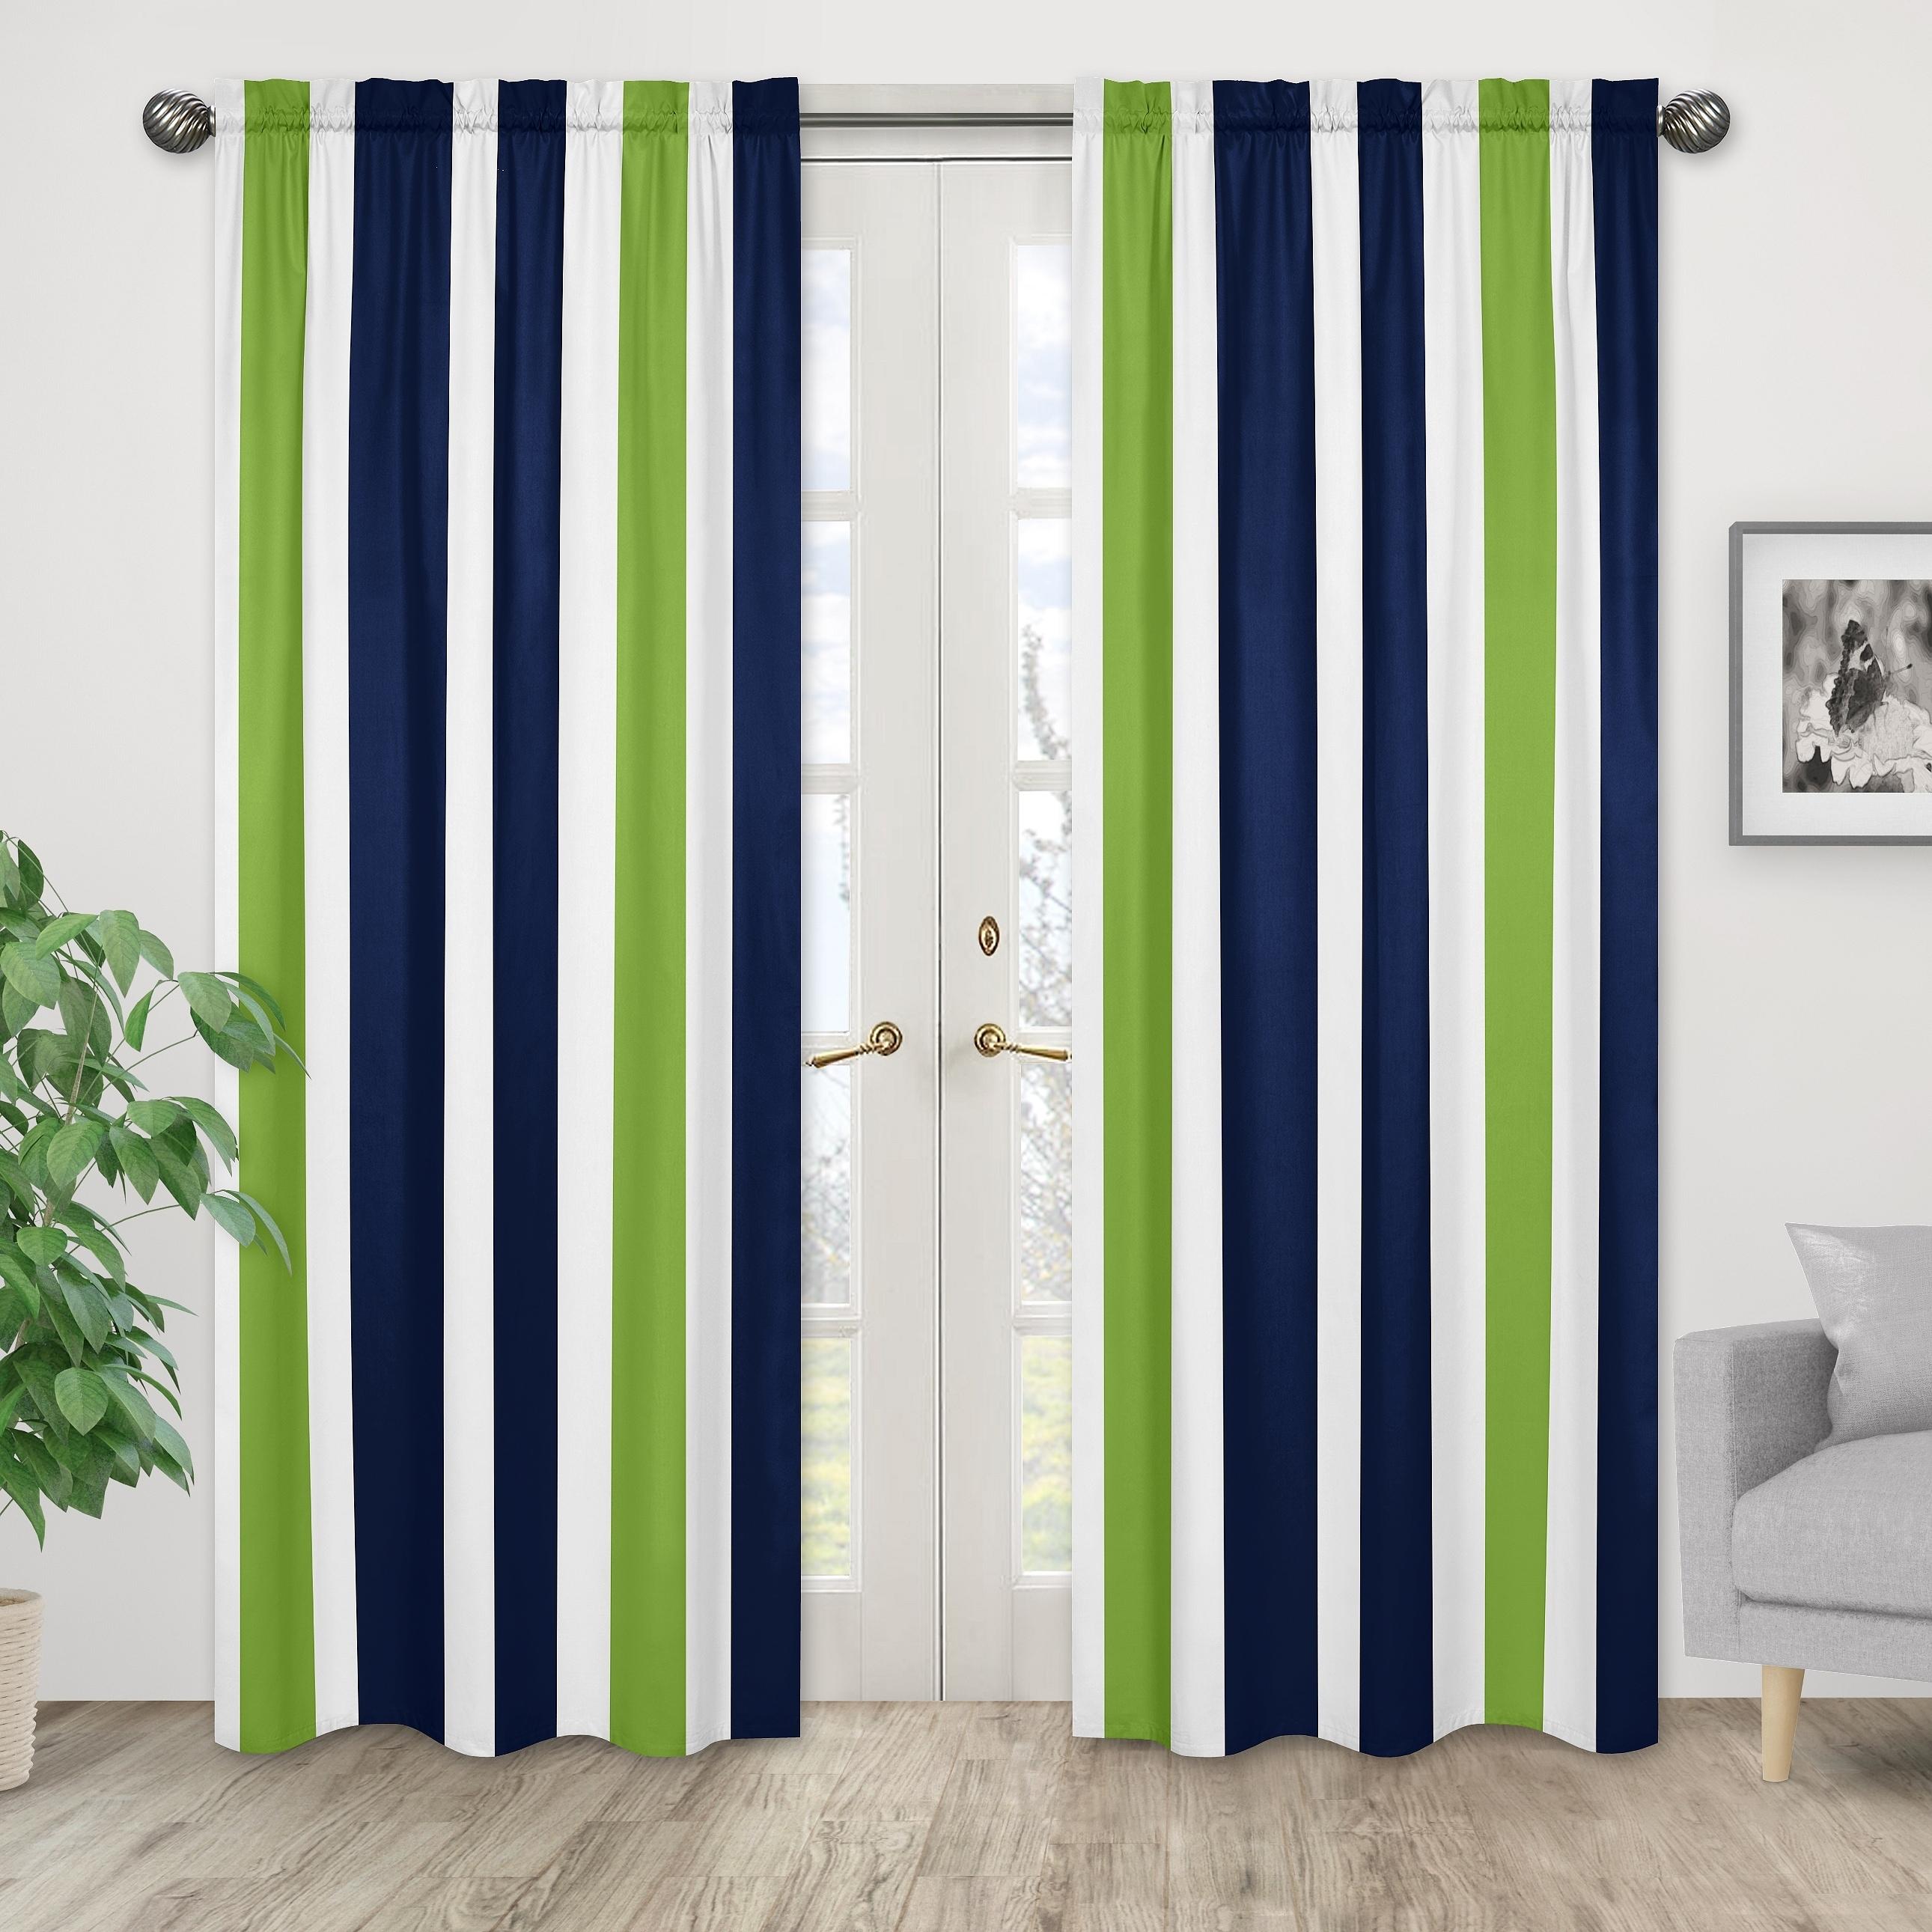 Sweet Jojo Designs Striped Navy Blue Lime Green White Window Curtain Panel Pair Overstock 14521006